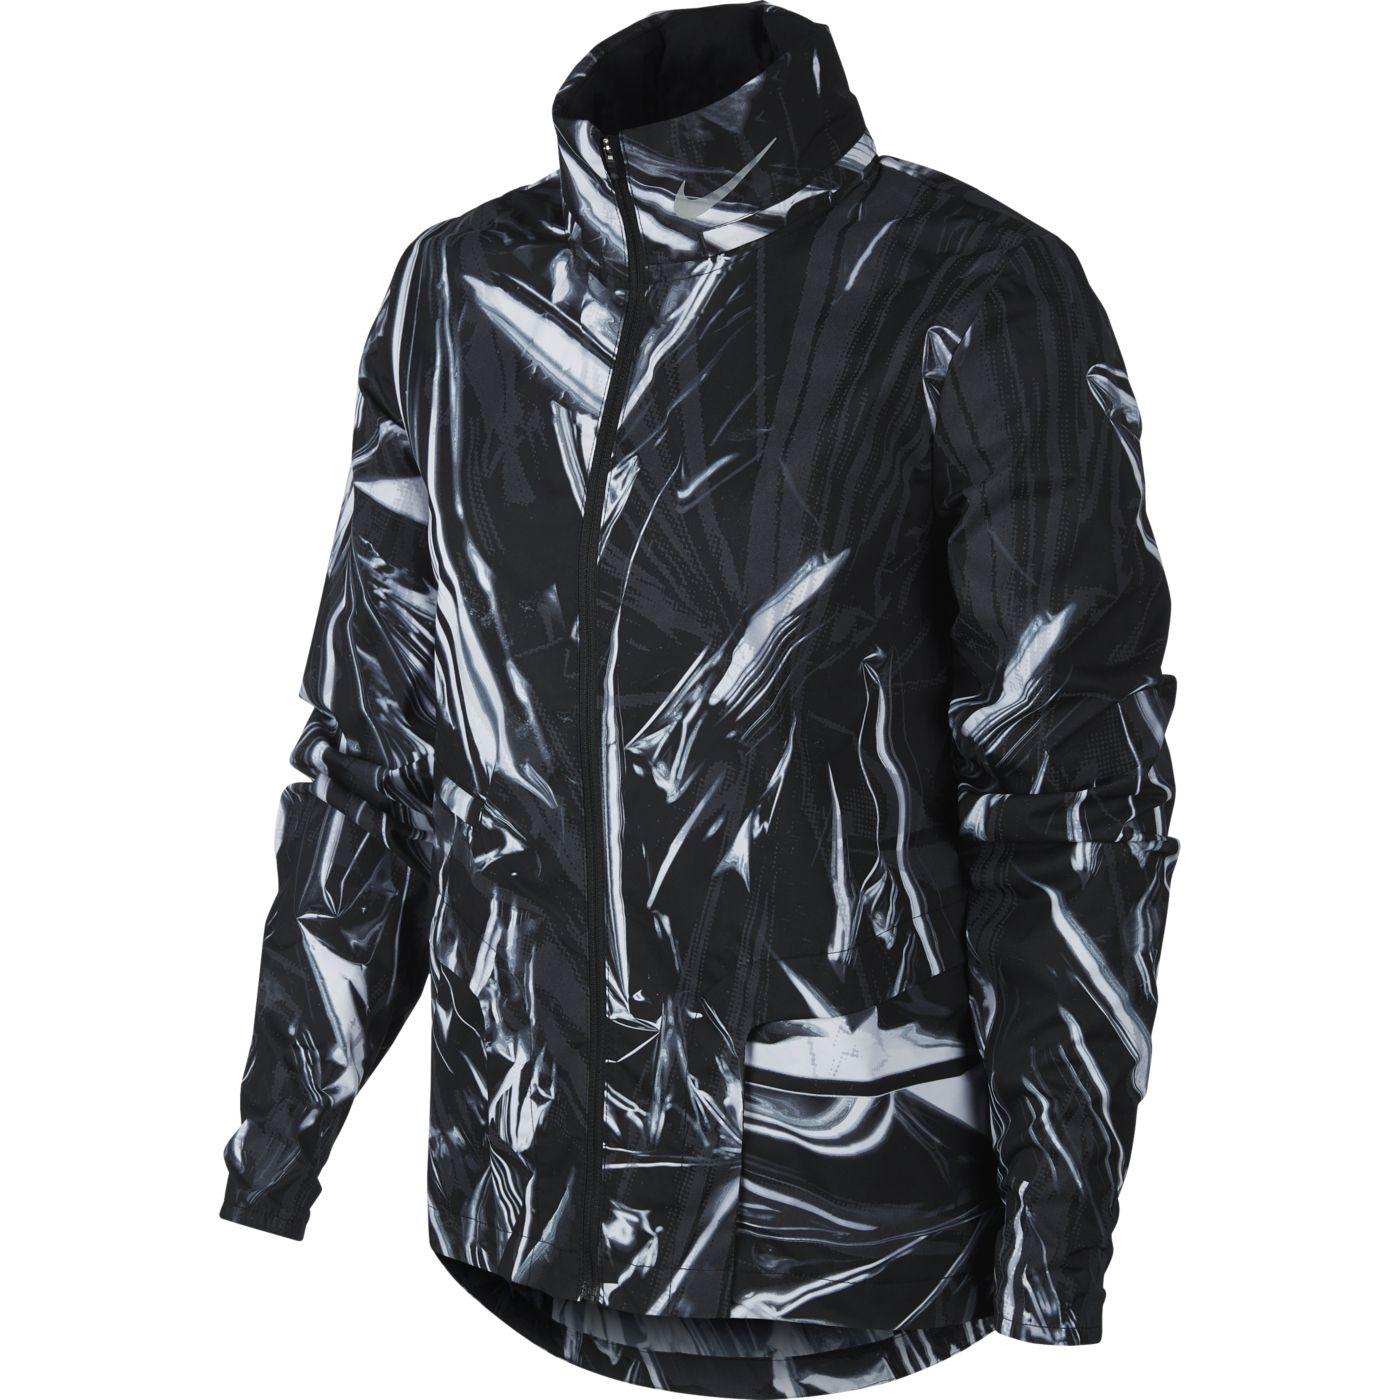 Nike Women's Shield Full Zip Flash Running Jacket